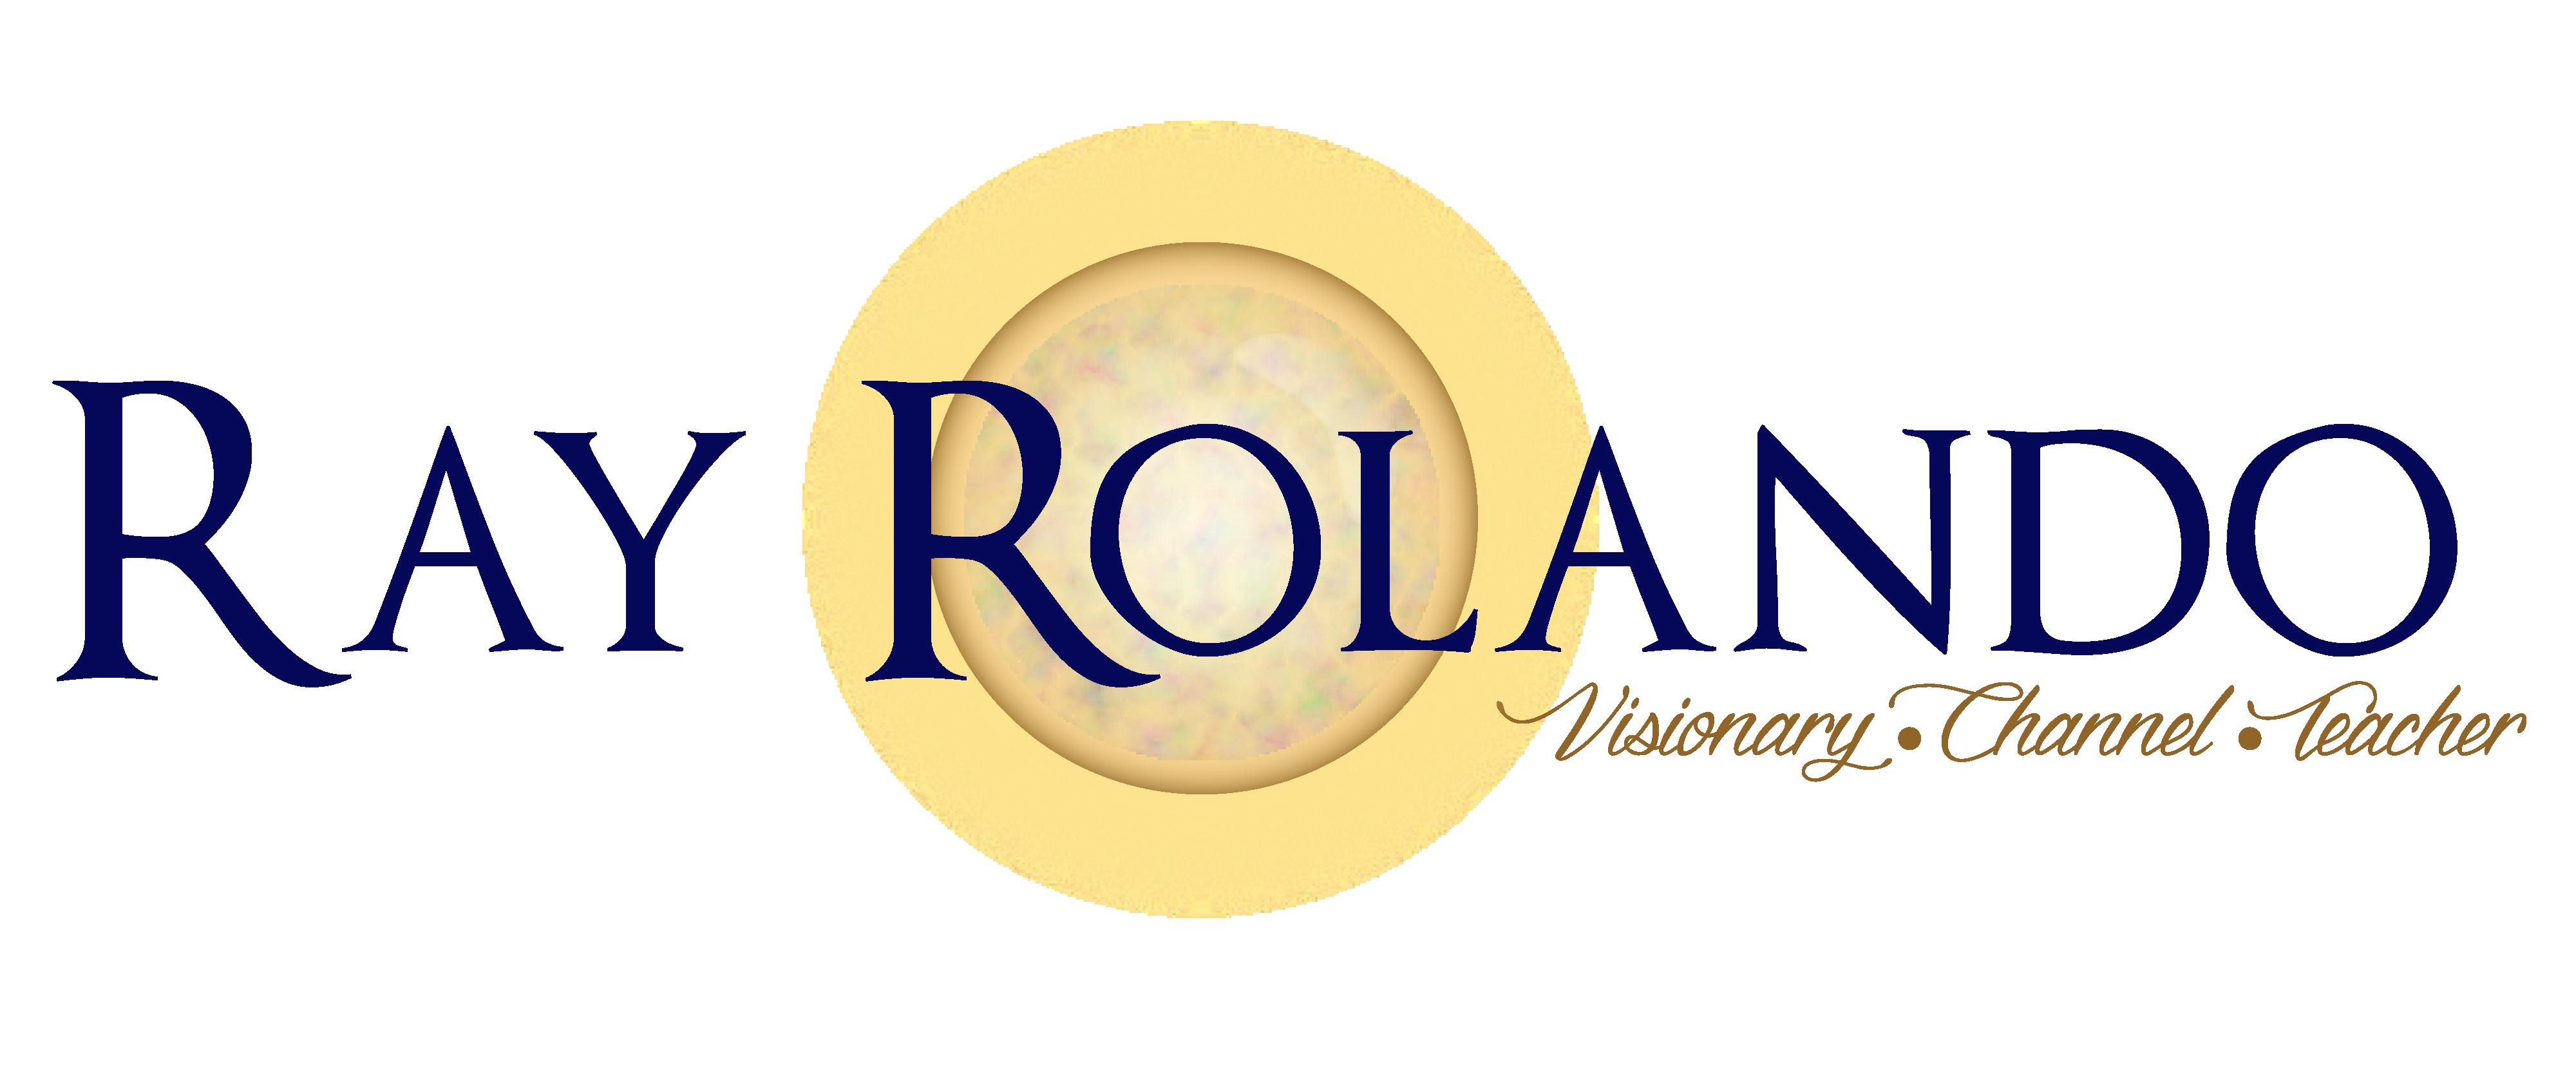 Ray Rolando title header